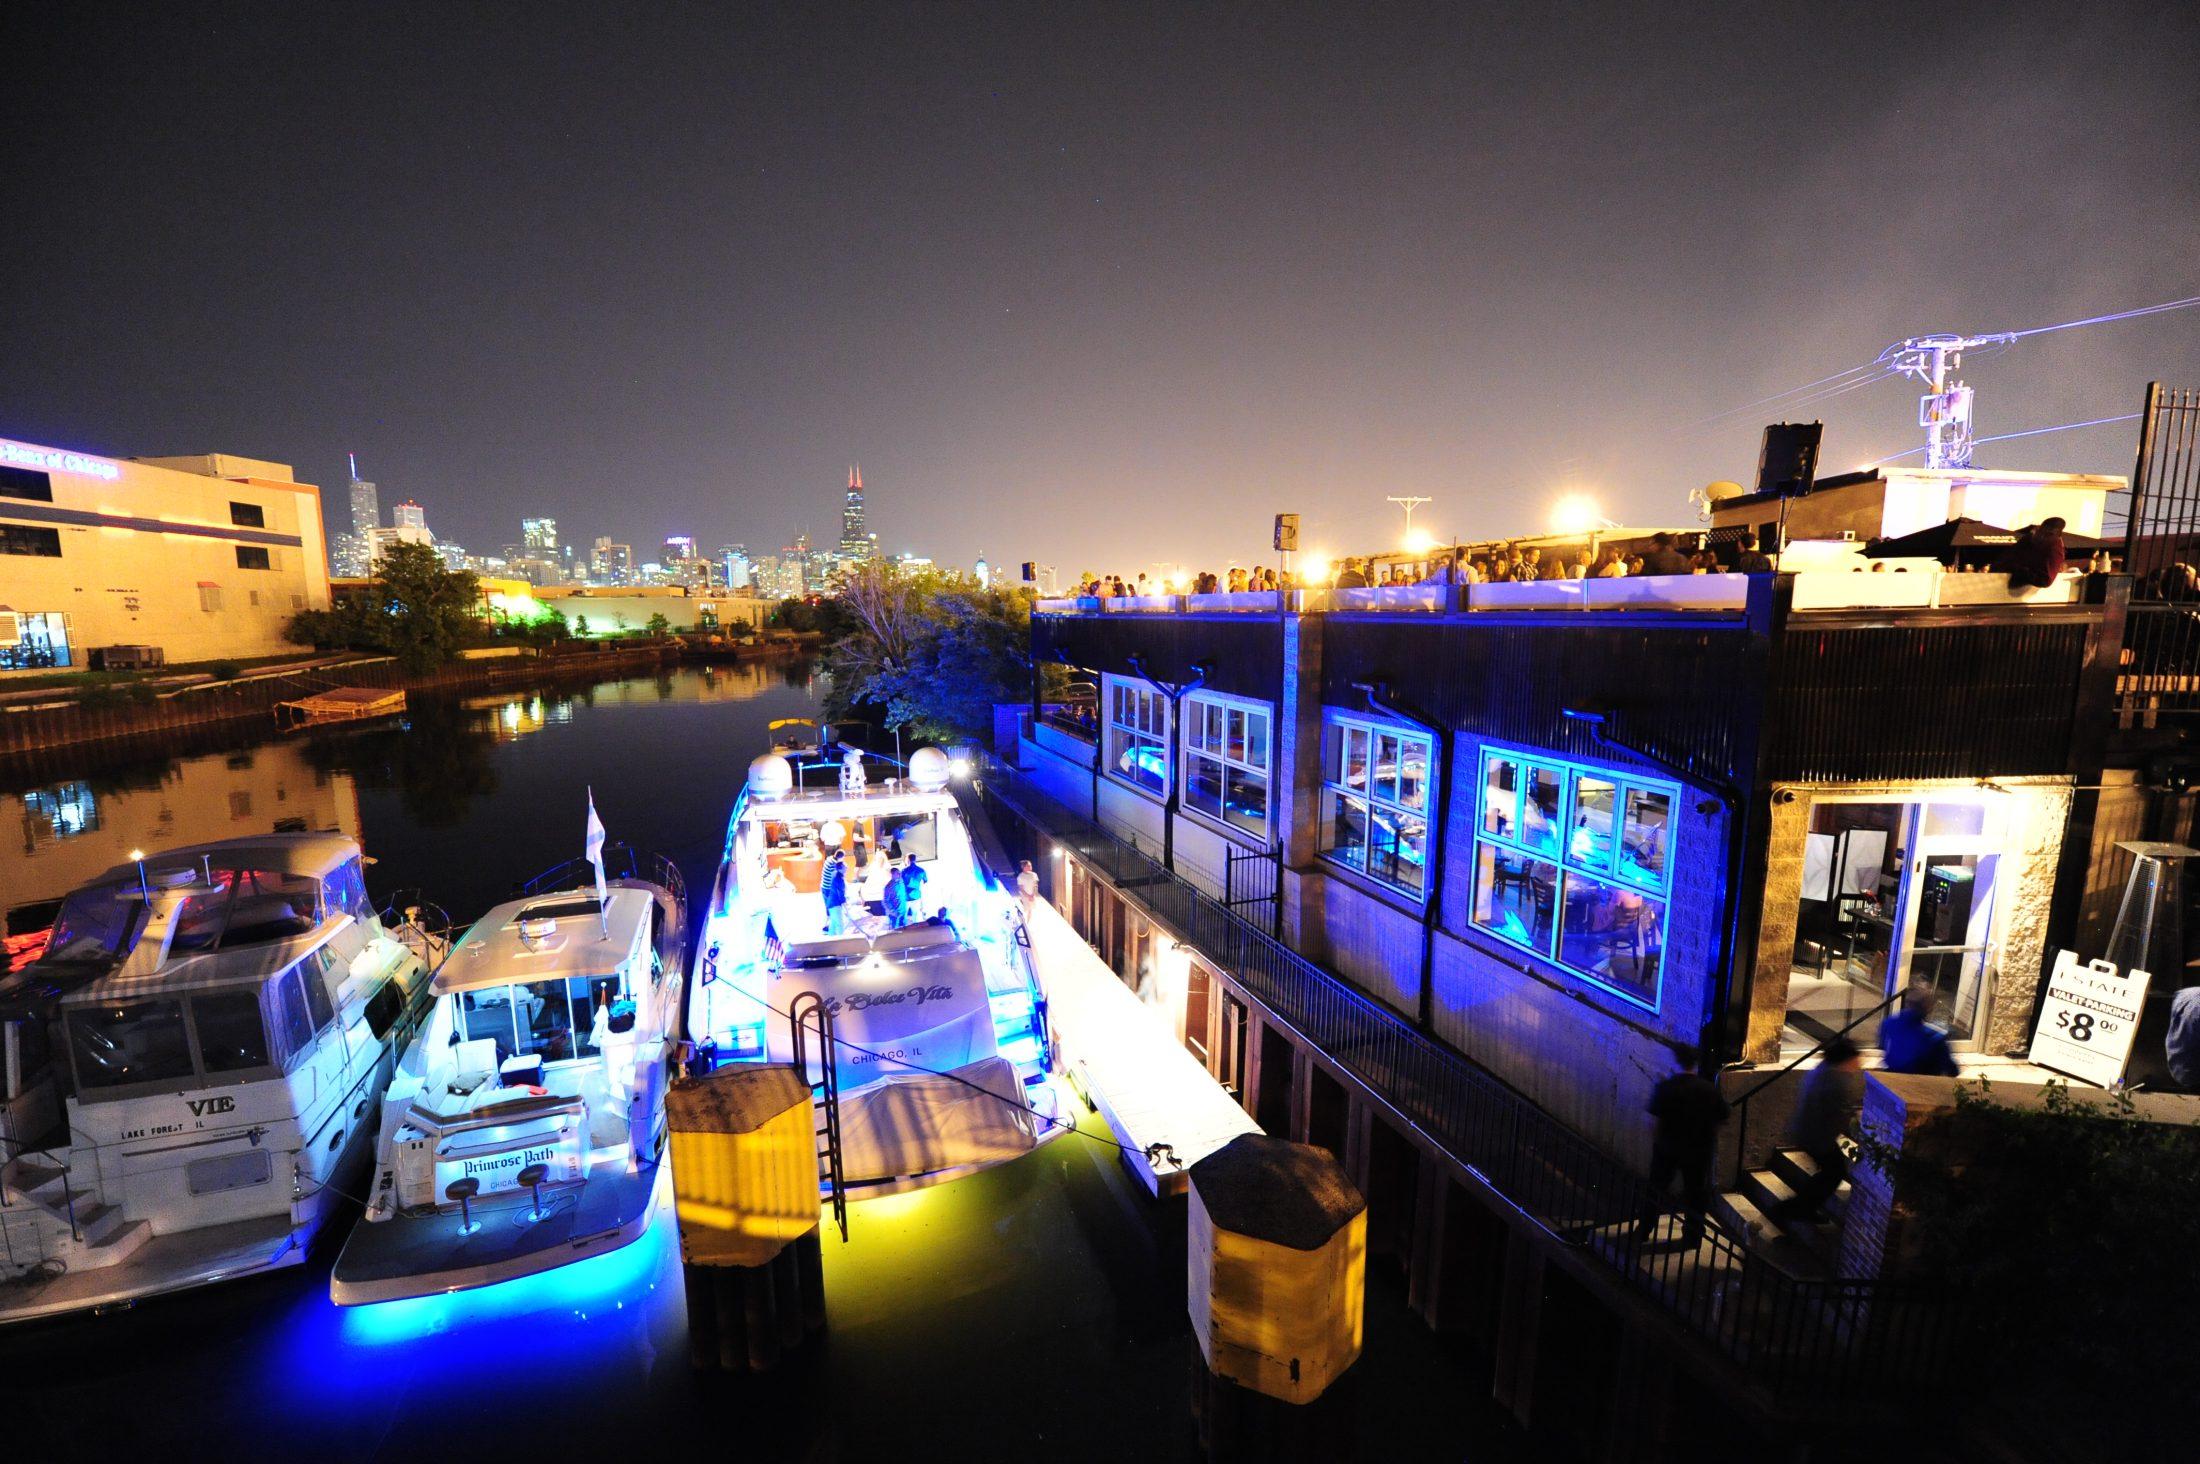 1406-pic-yacht-sd.jpg